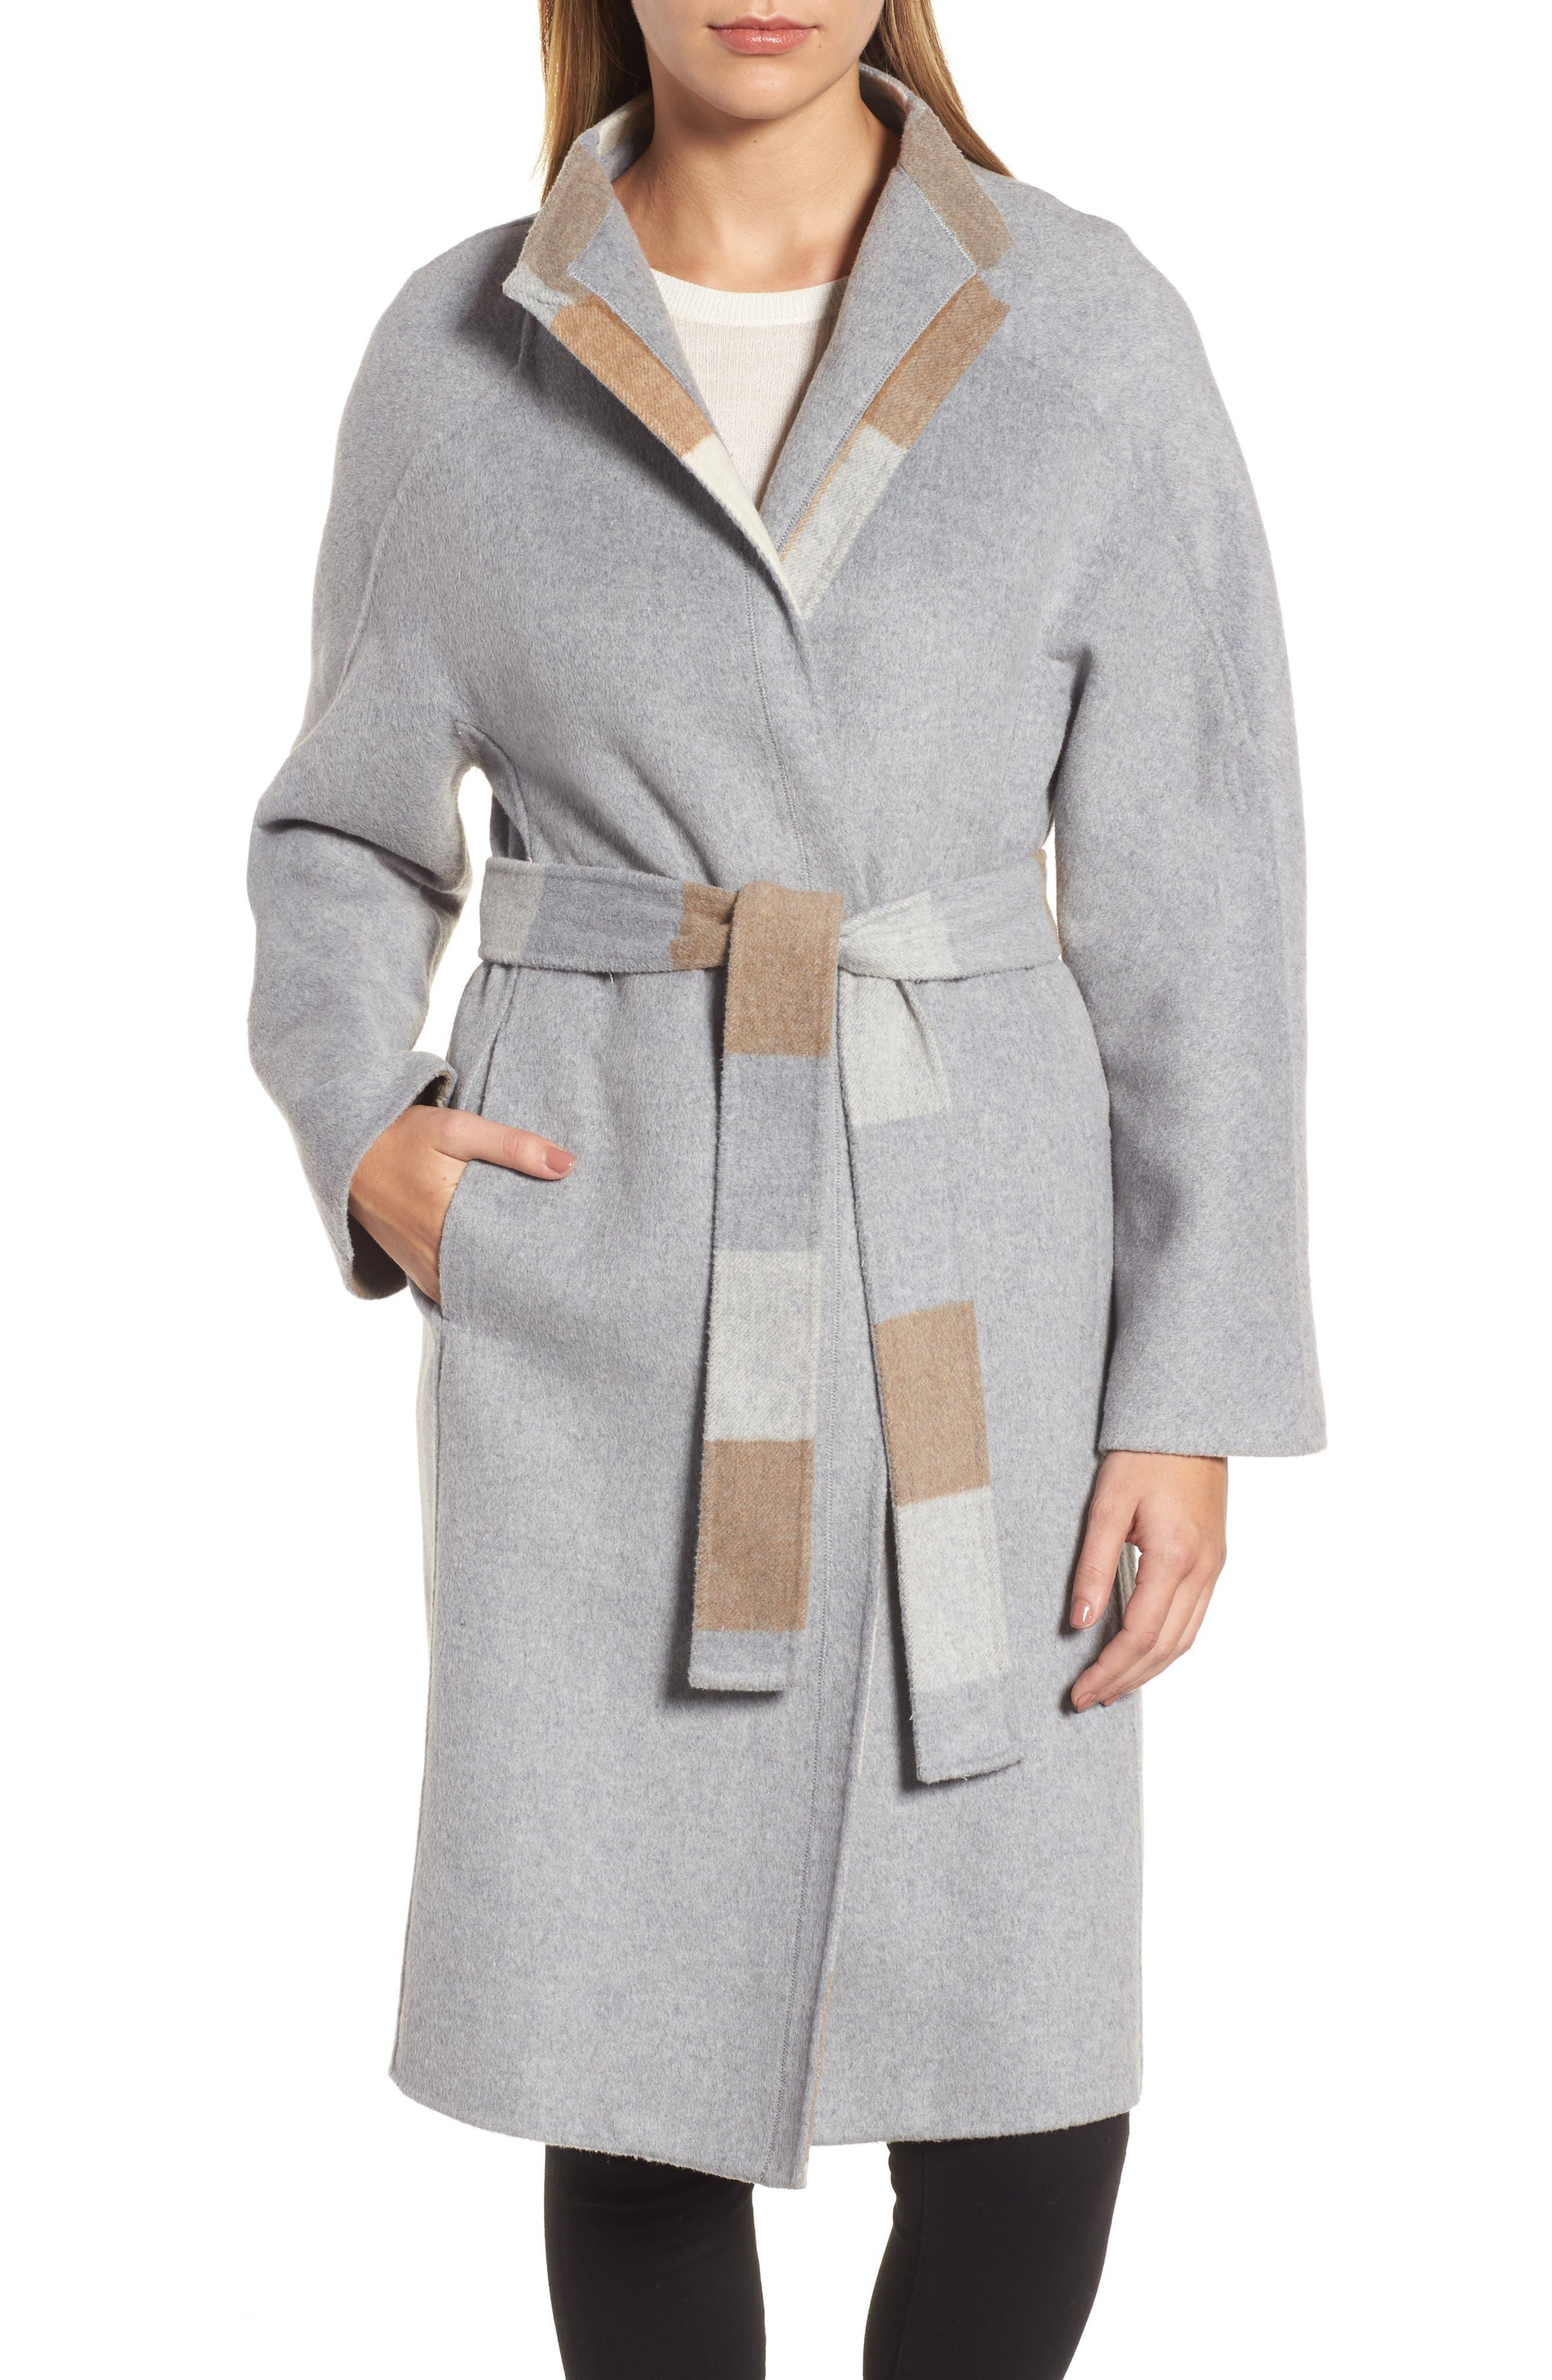 DKNY Wool Blend Wrap Coat,                         Main,                         color,